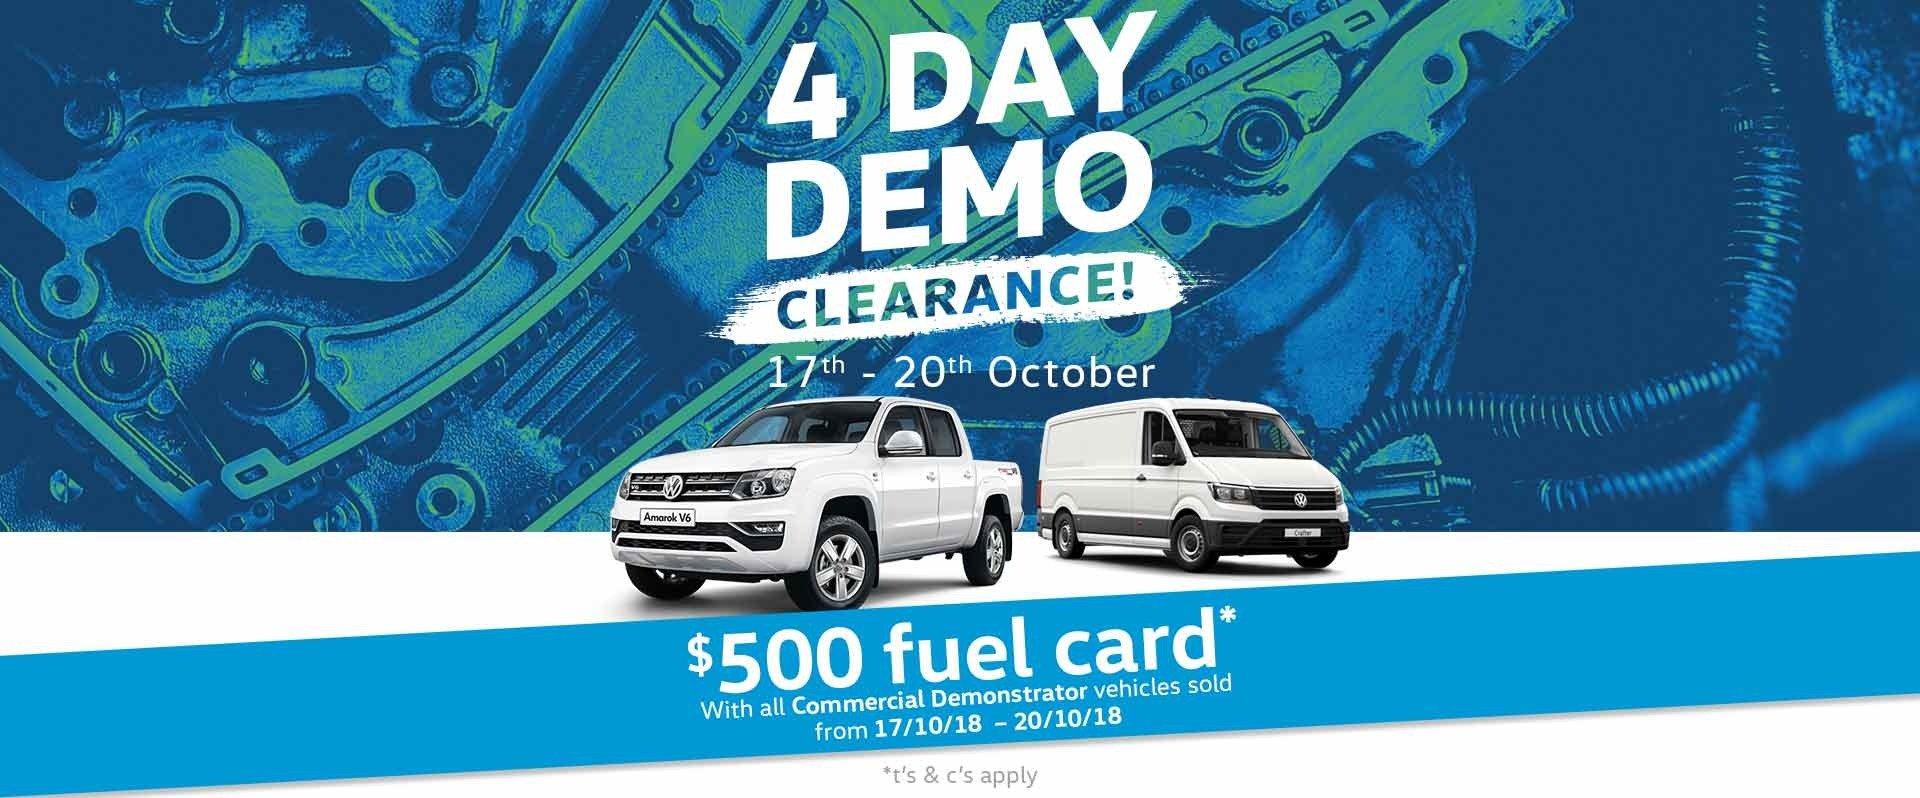 FTG Volkswagen - 4 Day Demo Sale